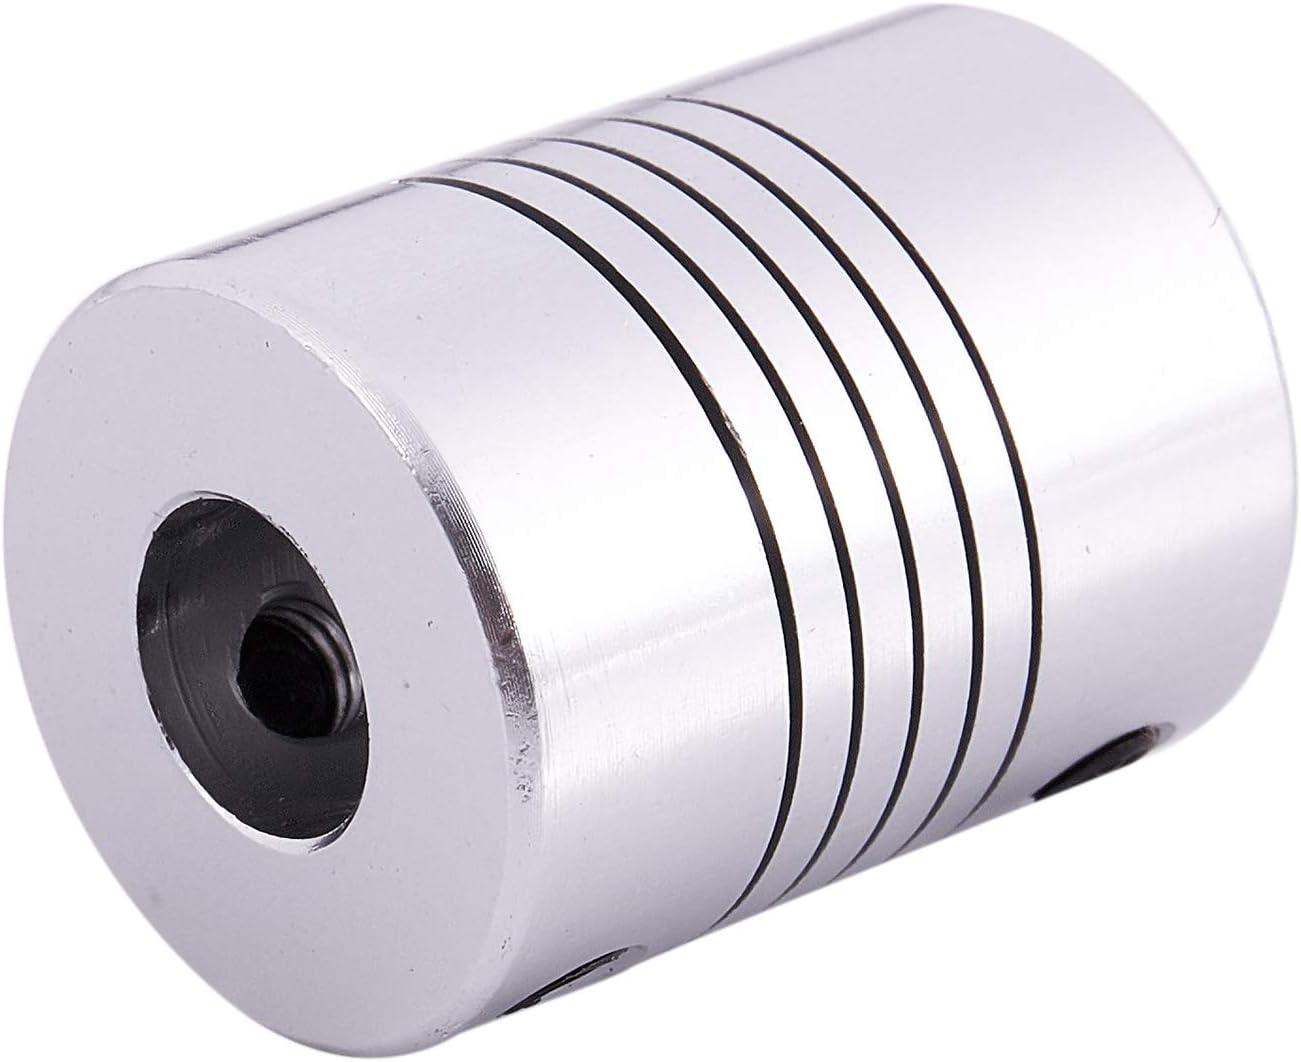 Naliovker CNC Motor Shaft Coupler 6.35mm to 8mm Flexible Coupling 6.35x8mm